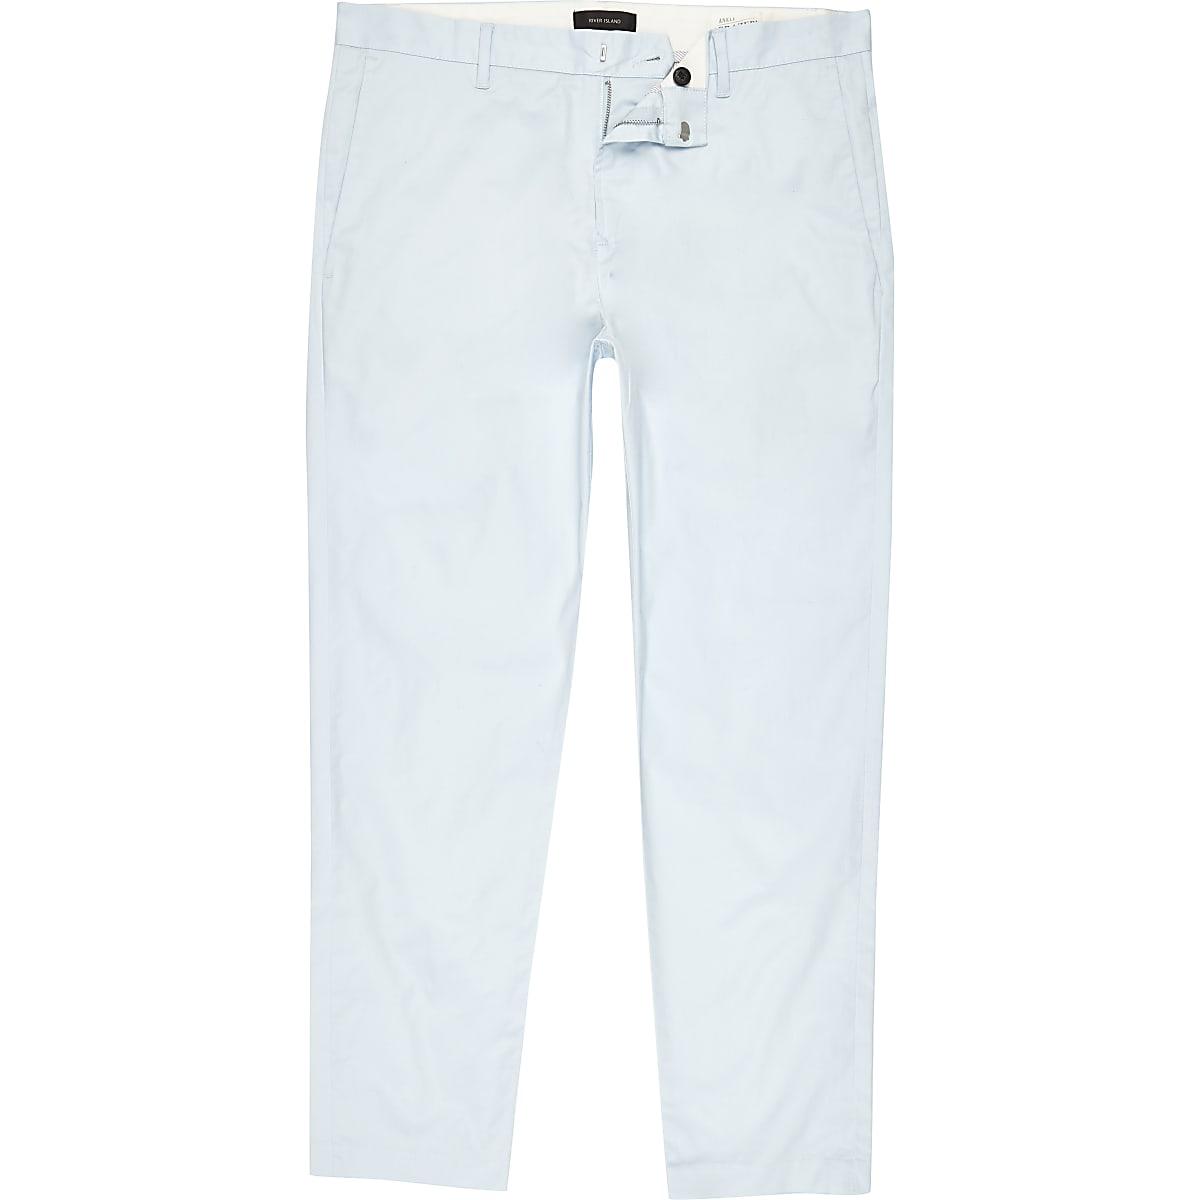 Light blue slim ankle grazer chino pants